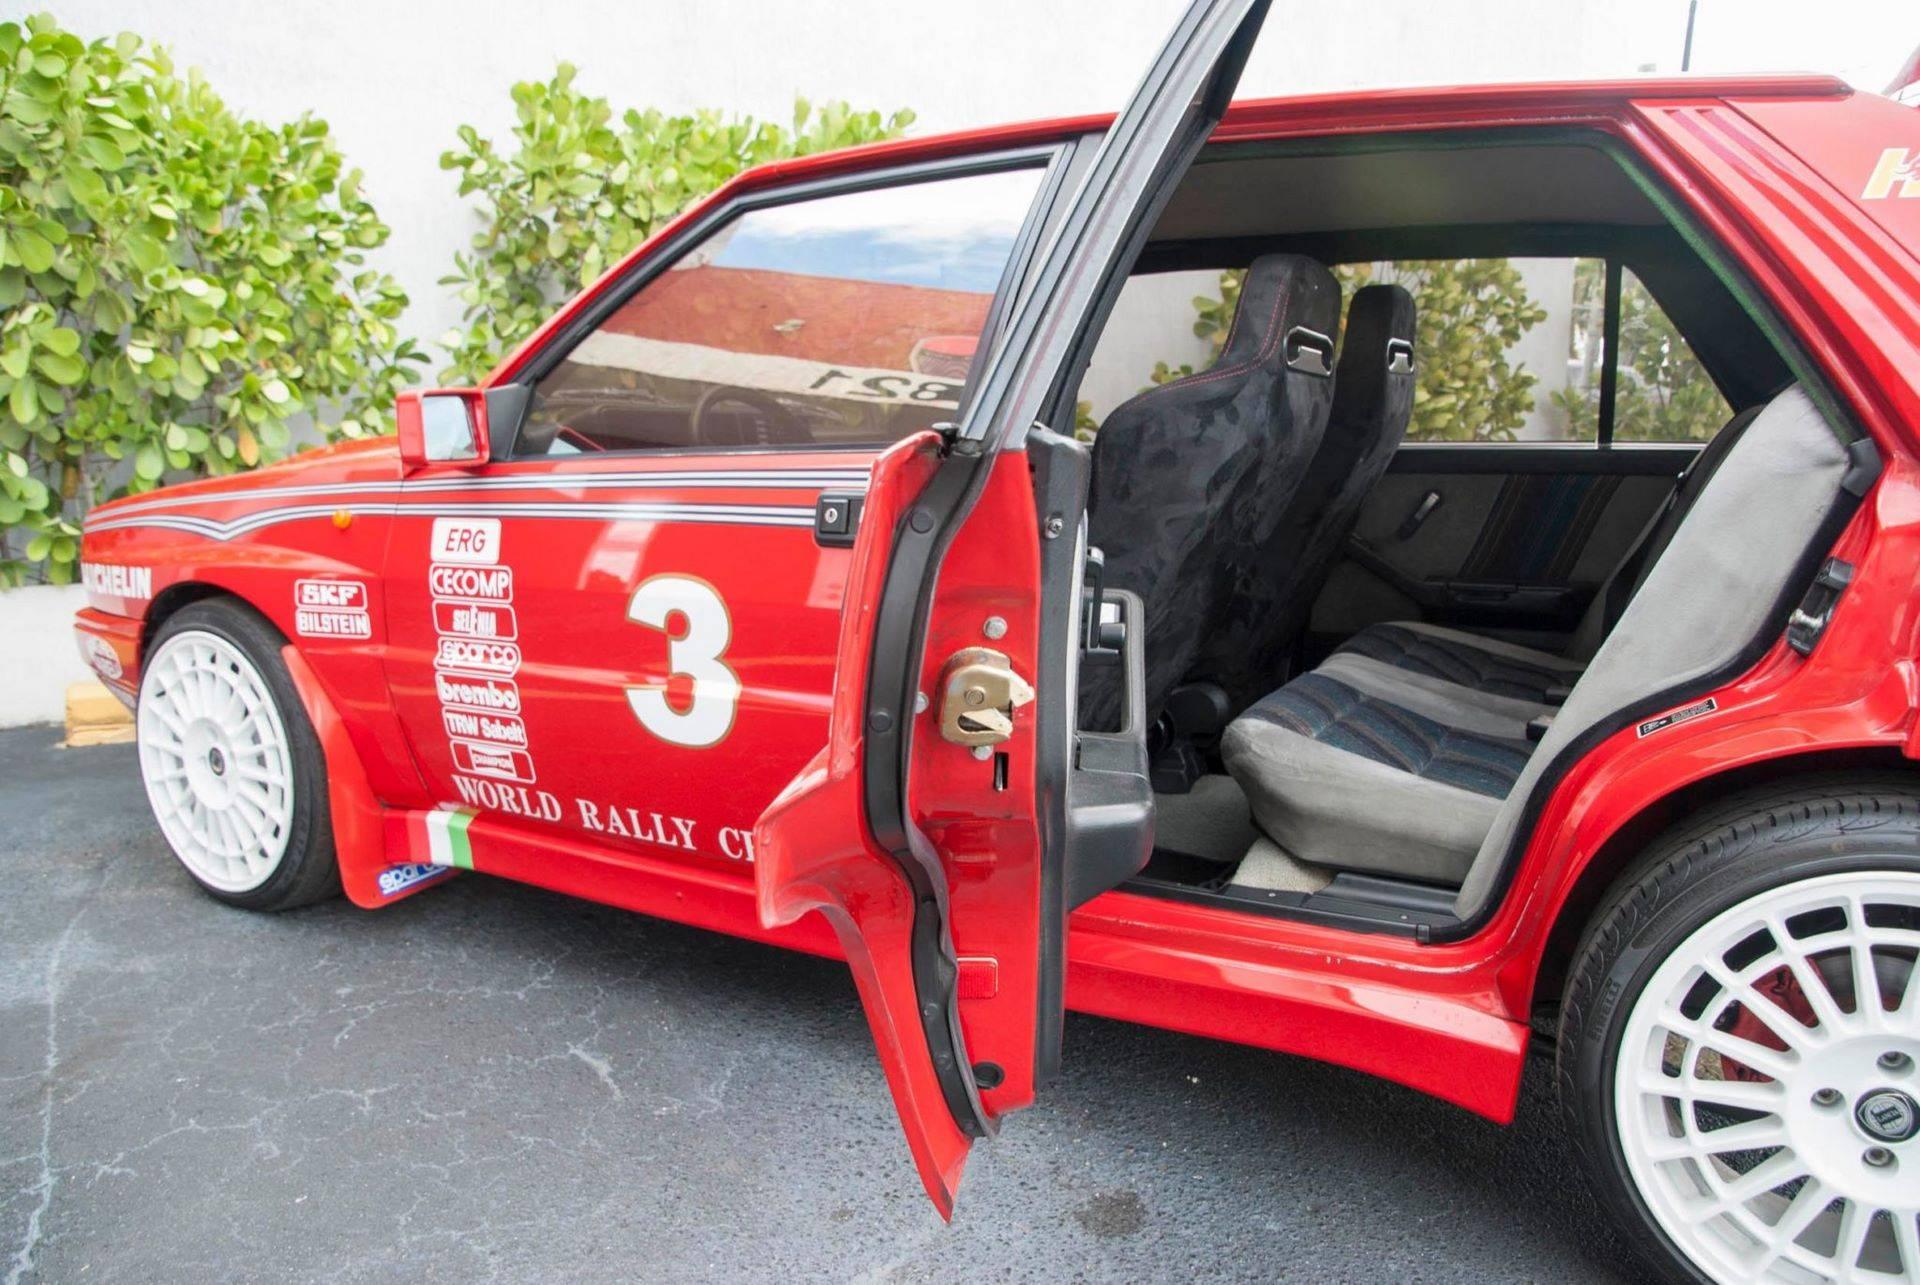 Lancia-Delta-Integrale-8V-1989-50